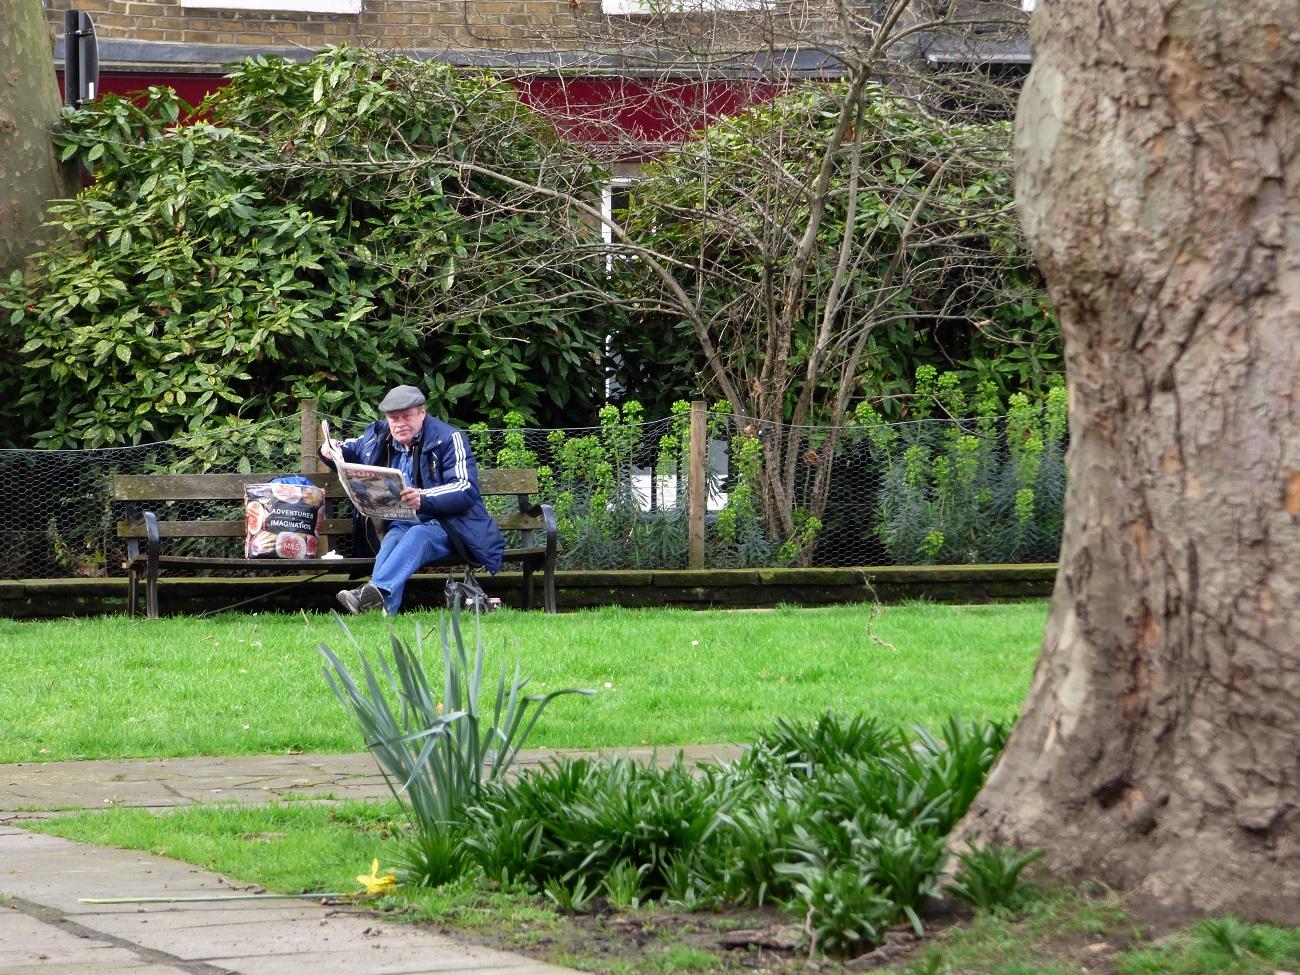 20170323_Islington_St-Lukes-Gardens_Distracted